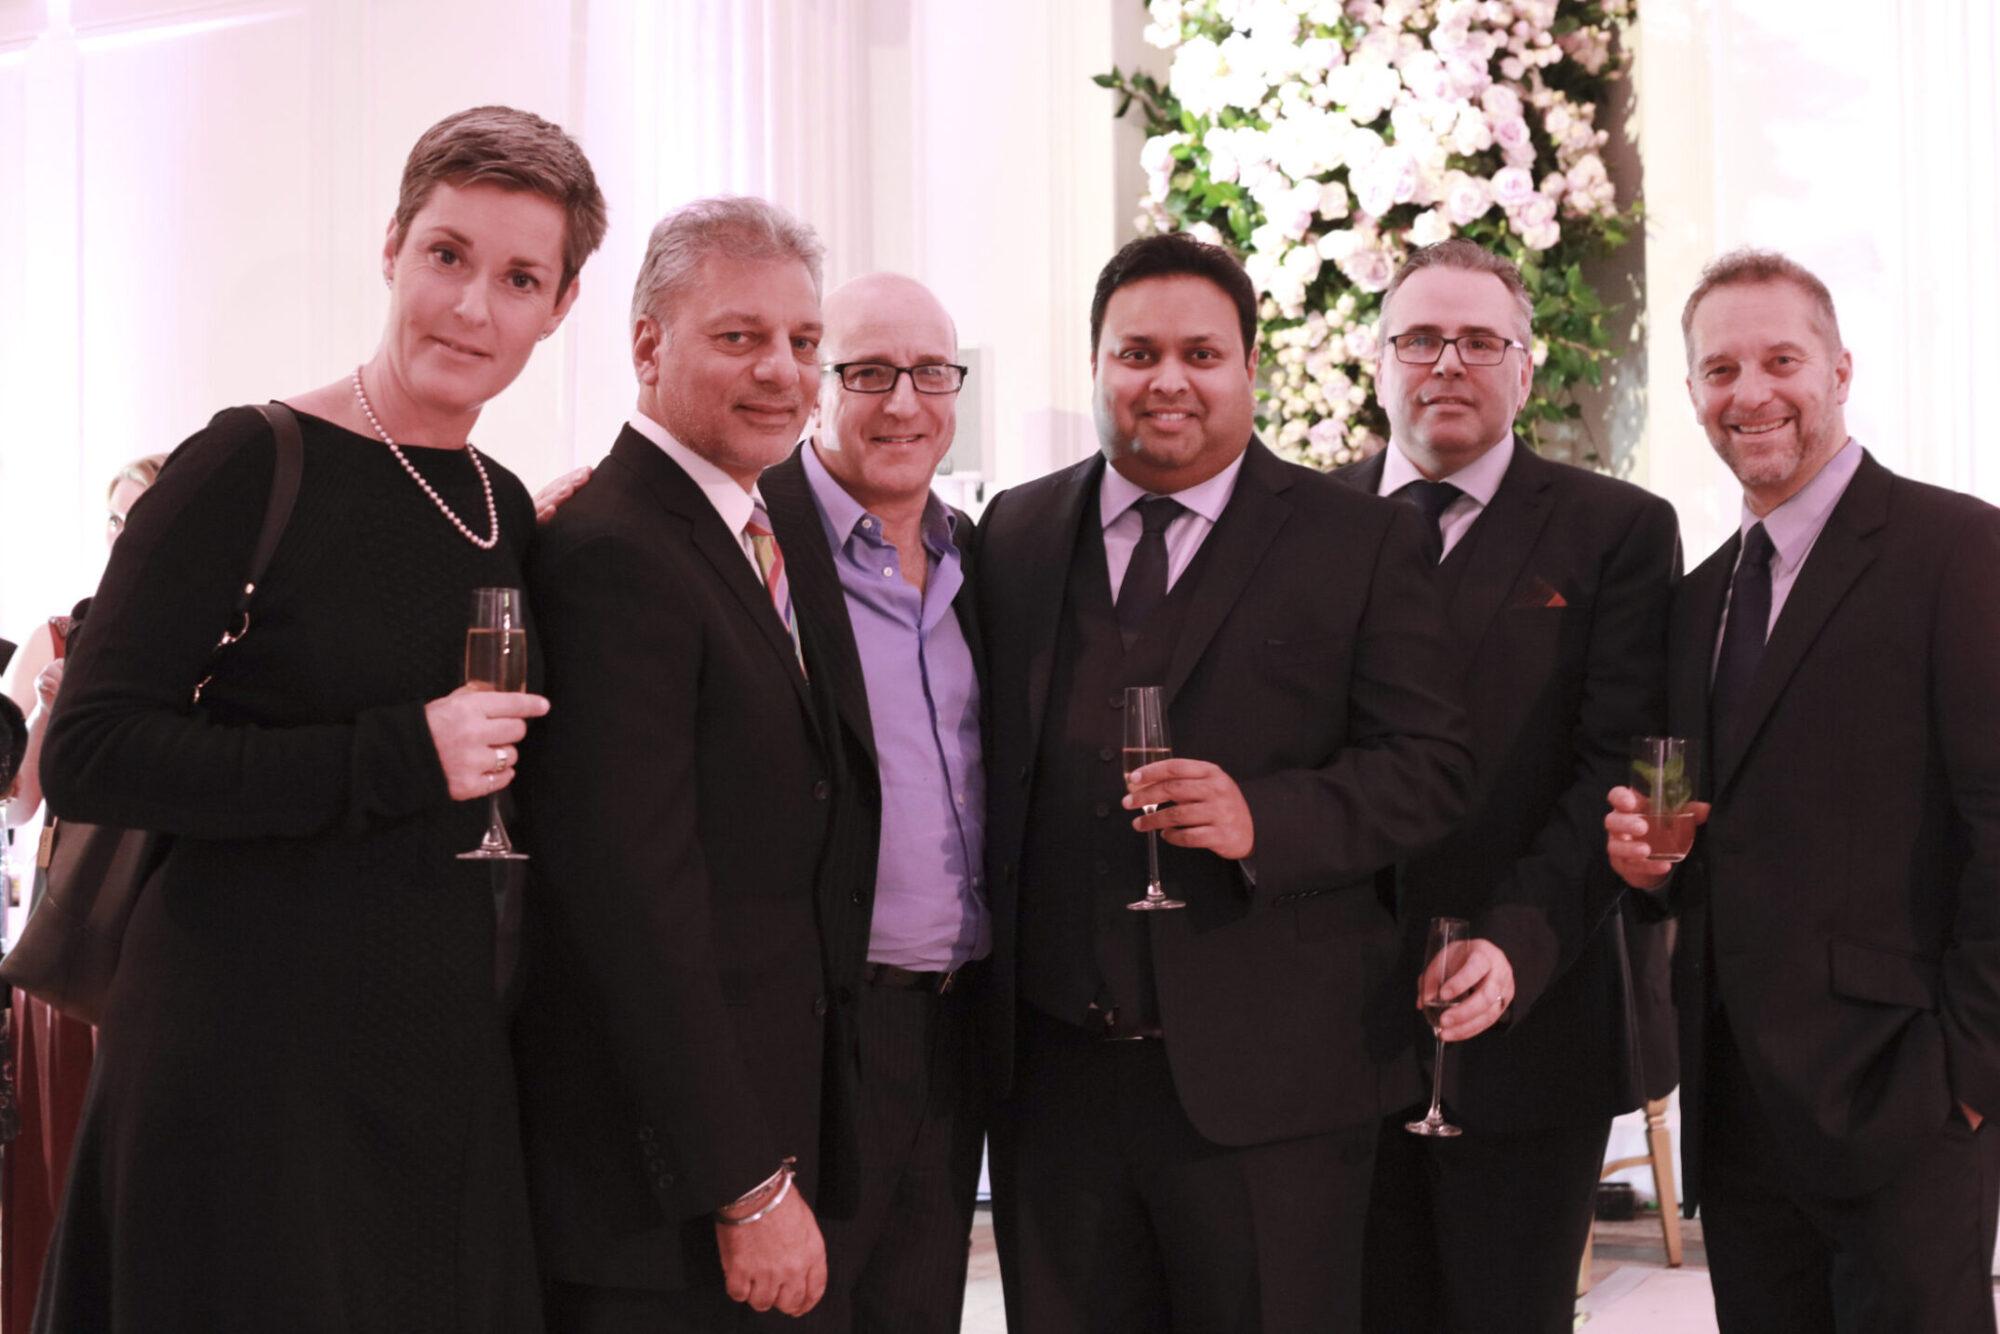 Sasha Dabliz (Schroders), Tony Matharu, Paul McKenna, Kevin Rochay, Nicholas Baker (Rochay), Stephen Edwards (Rochay)